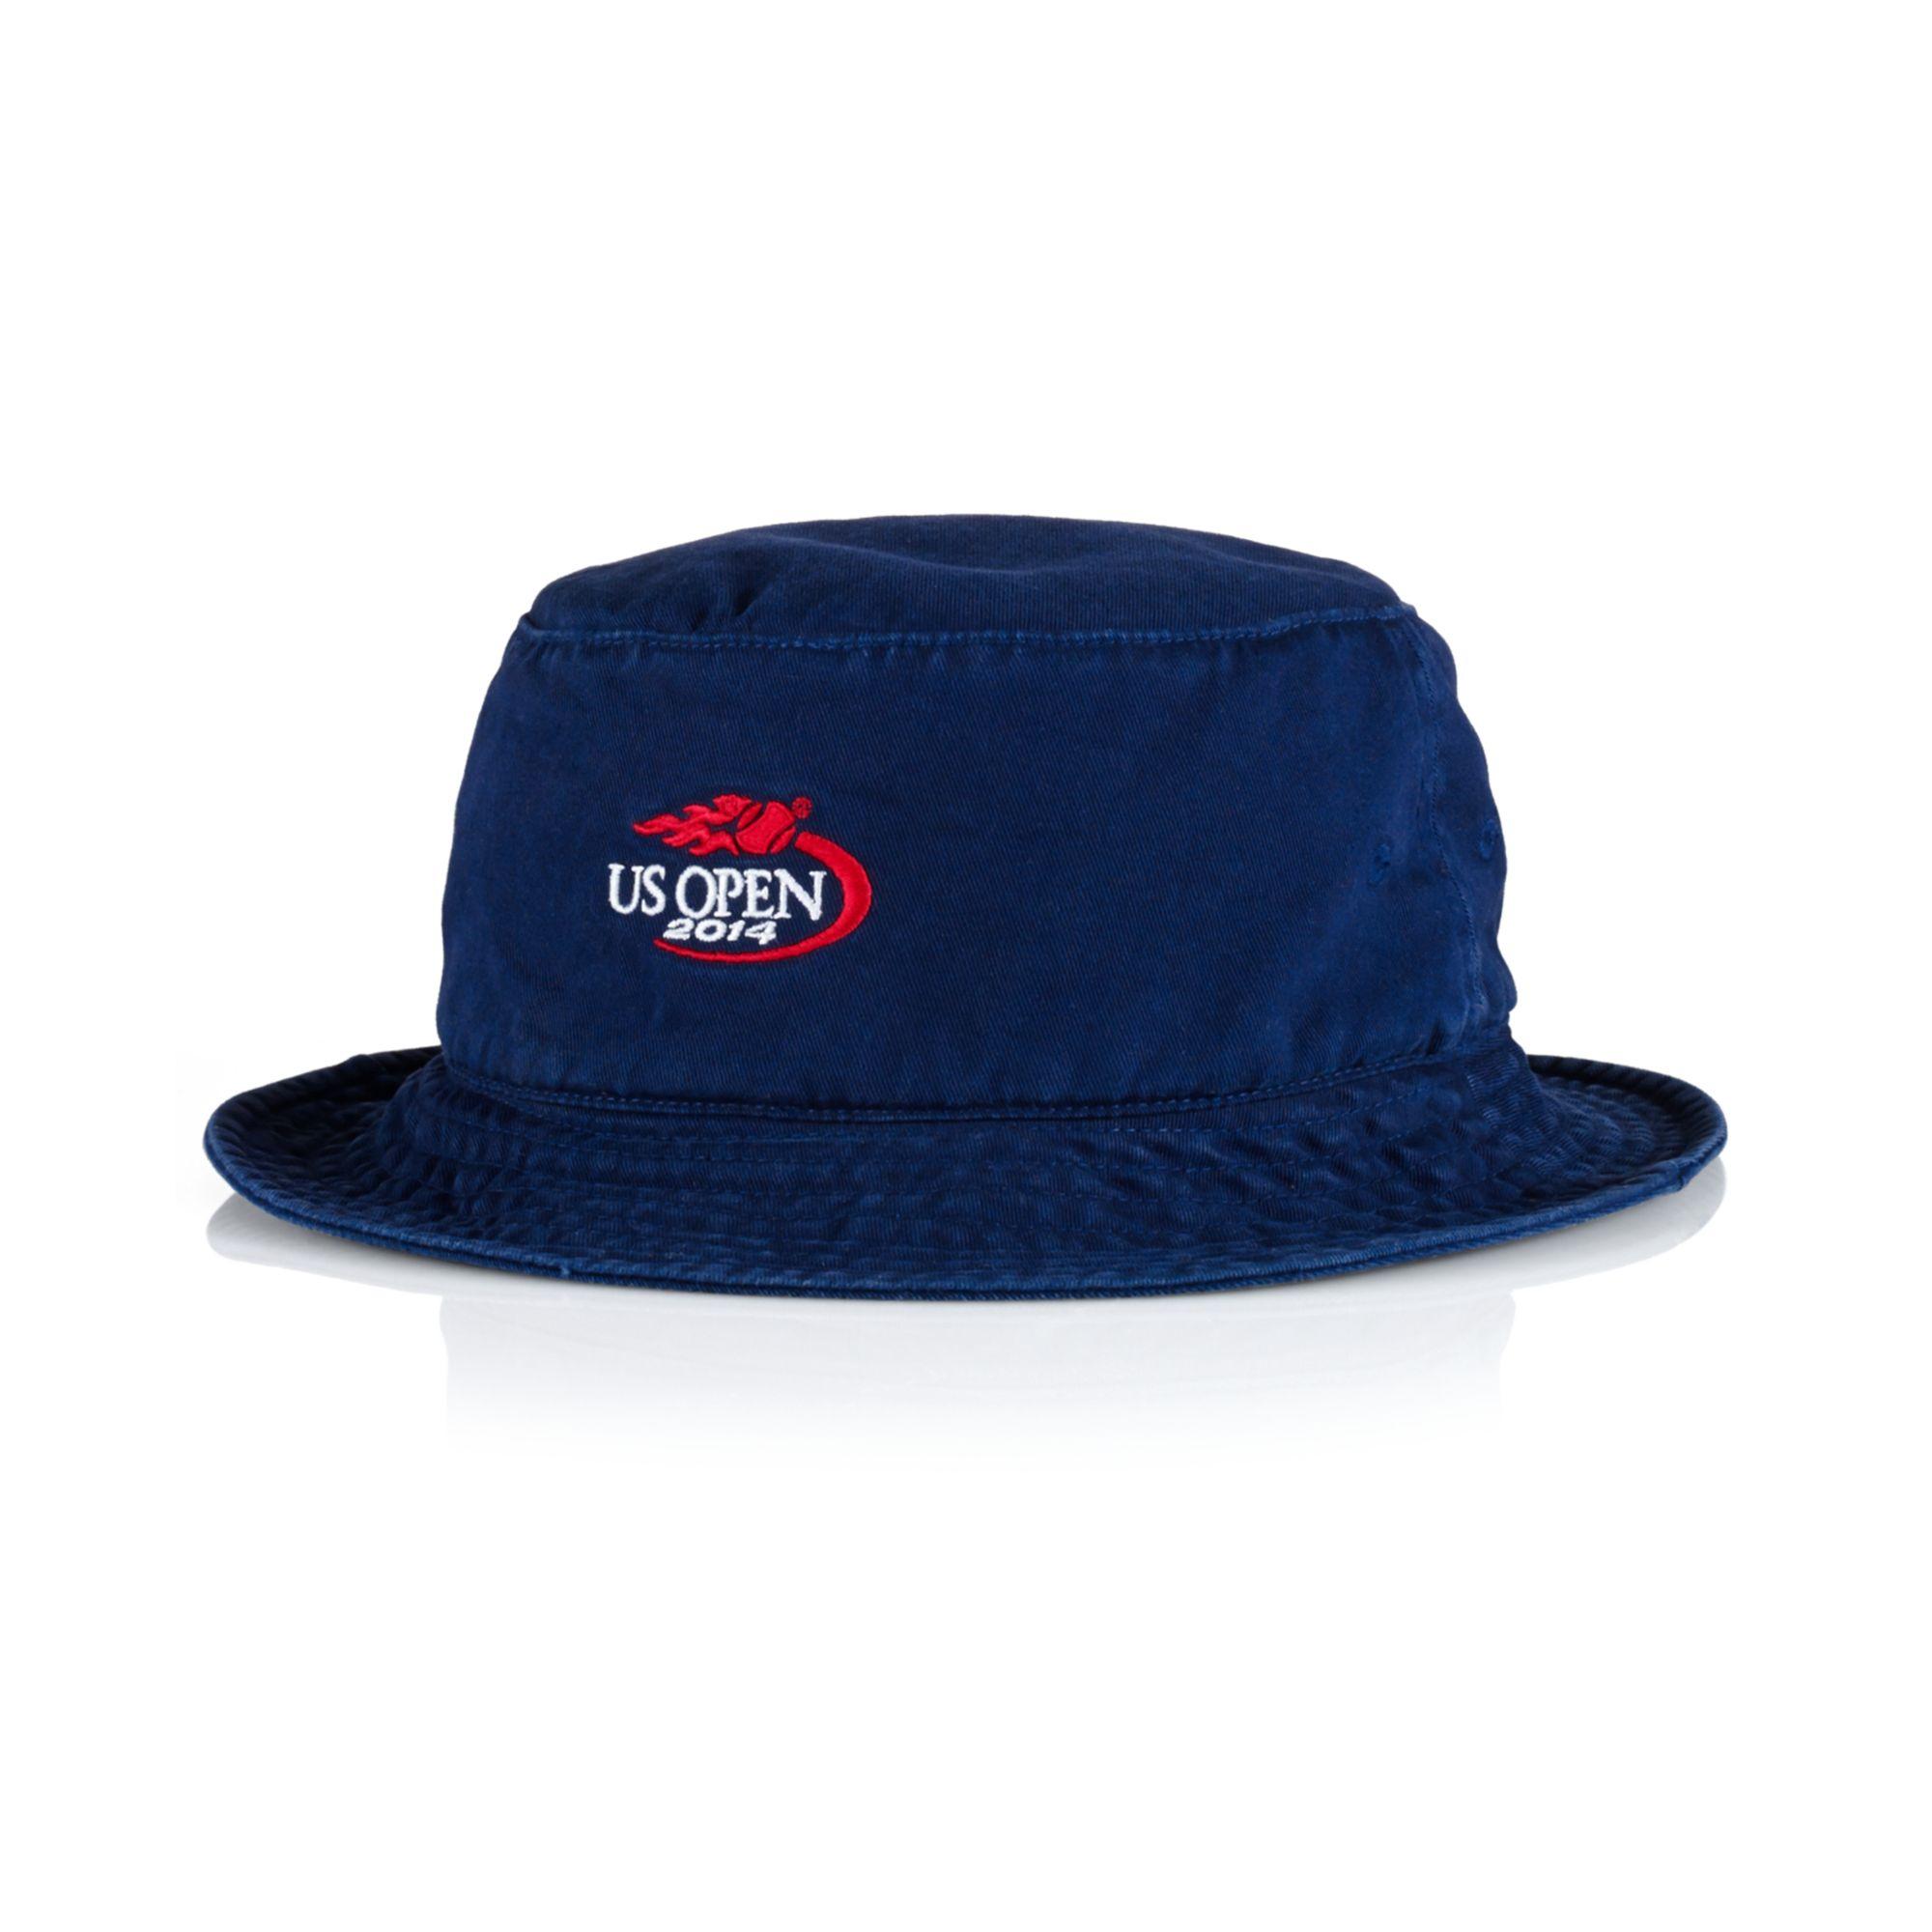 Lyst Ralph Lauren Polo Us Open Bucket Hat In Blue For Men